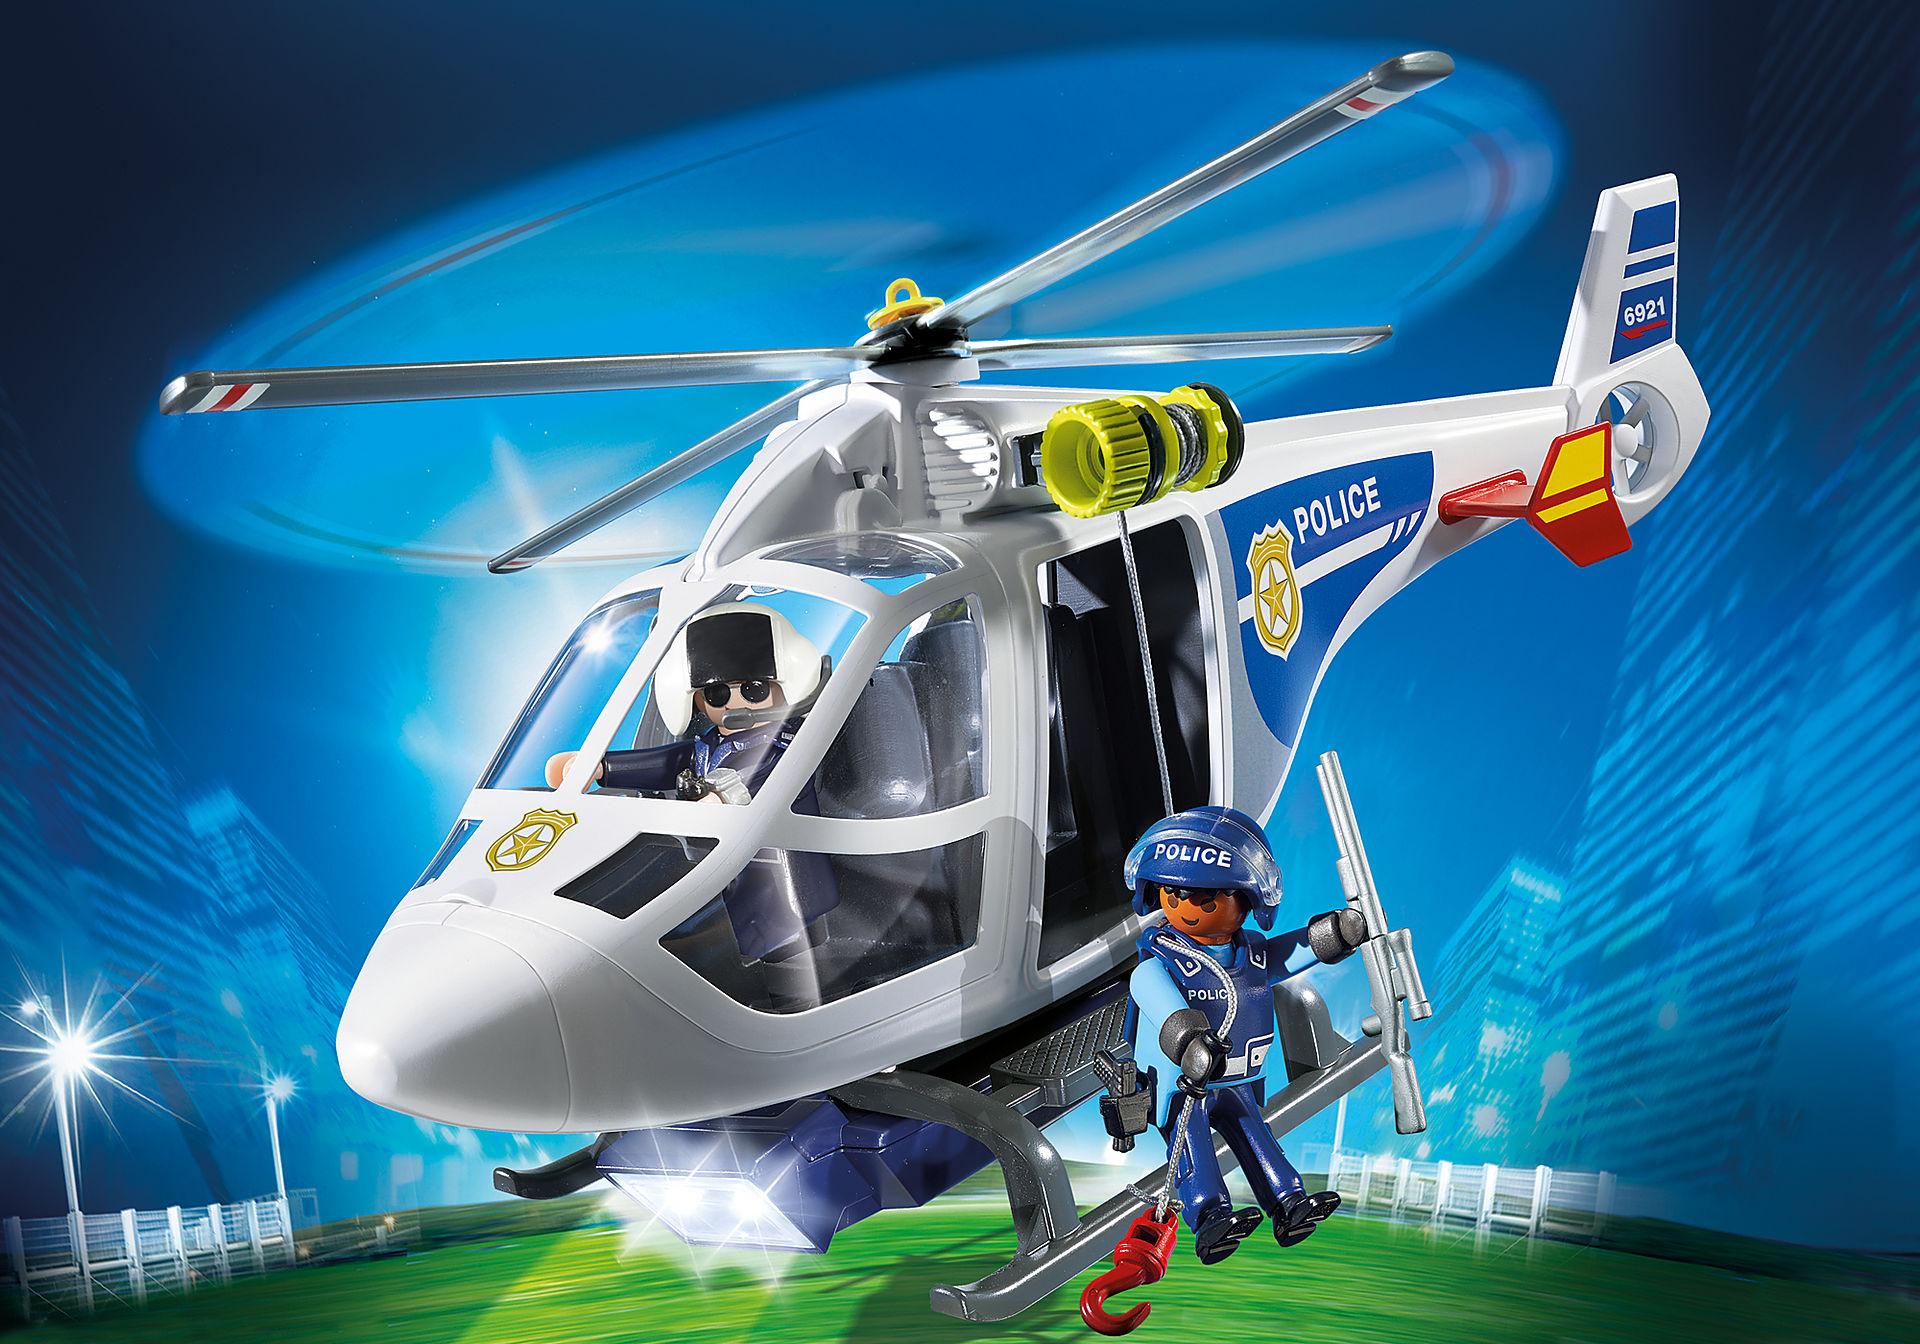 6921 Helicóptero de Policía con Luces LED zoom image1